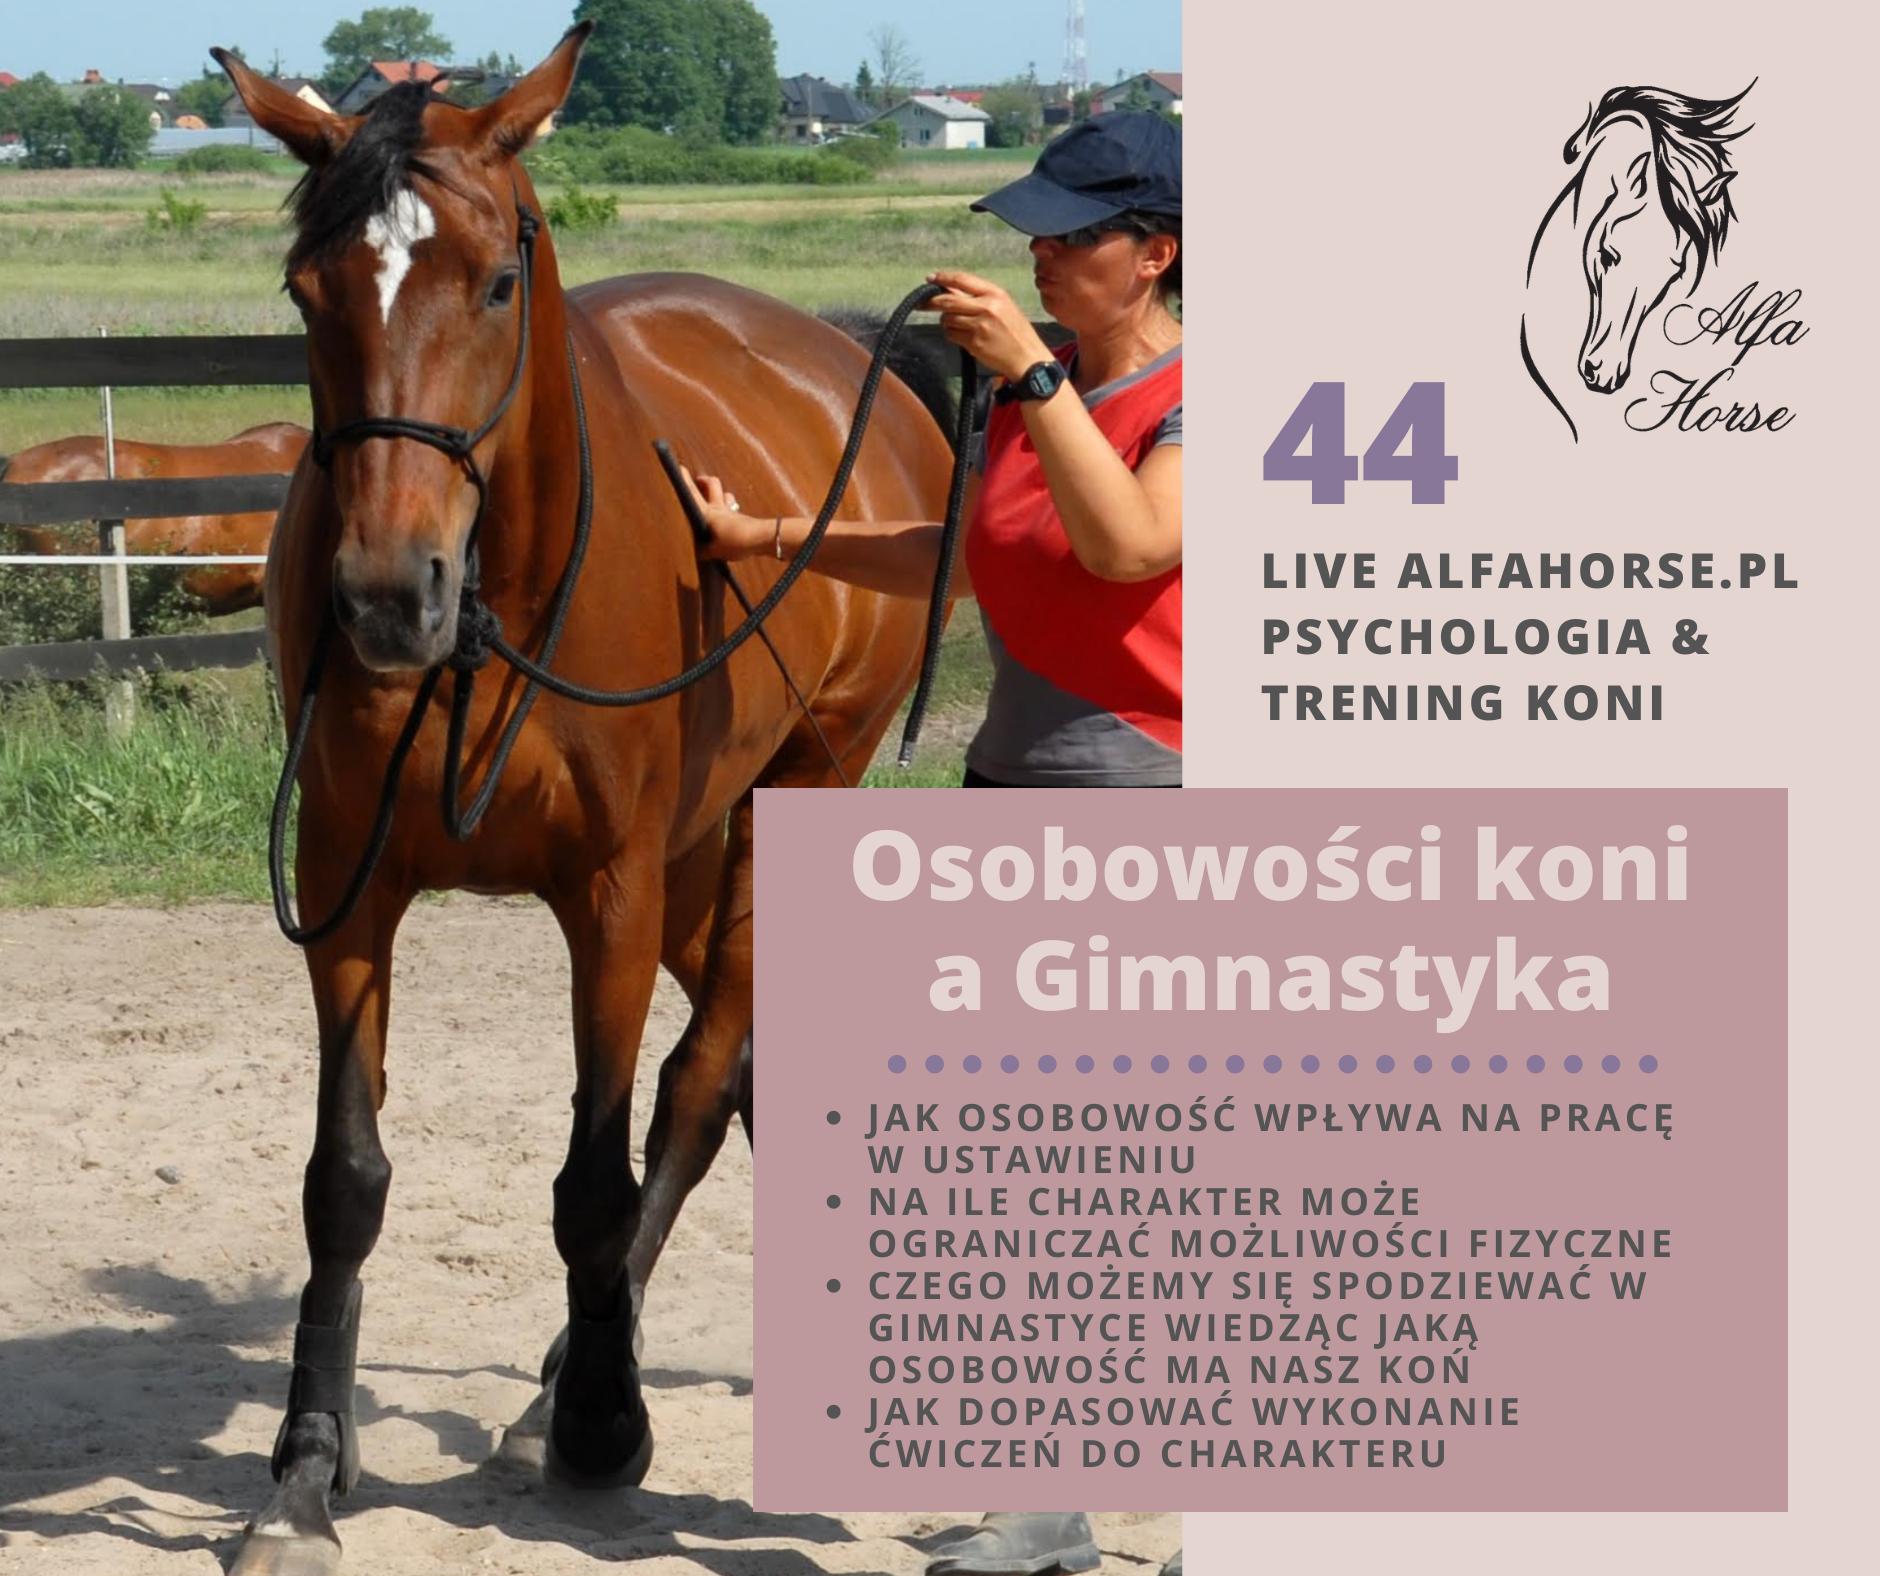 osobowosci_gimnastyka_konie_trening_live_alfa_horse